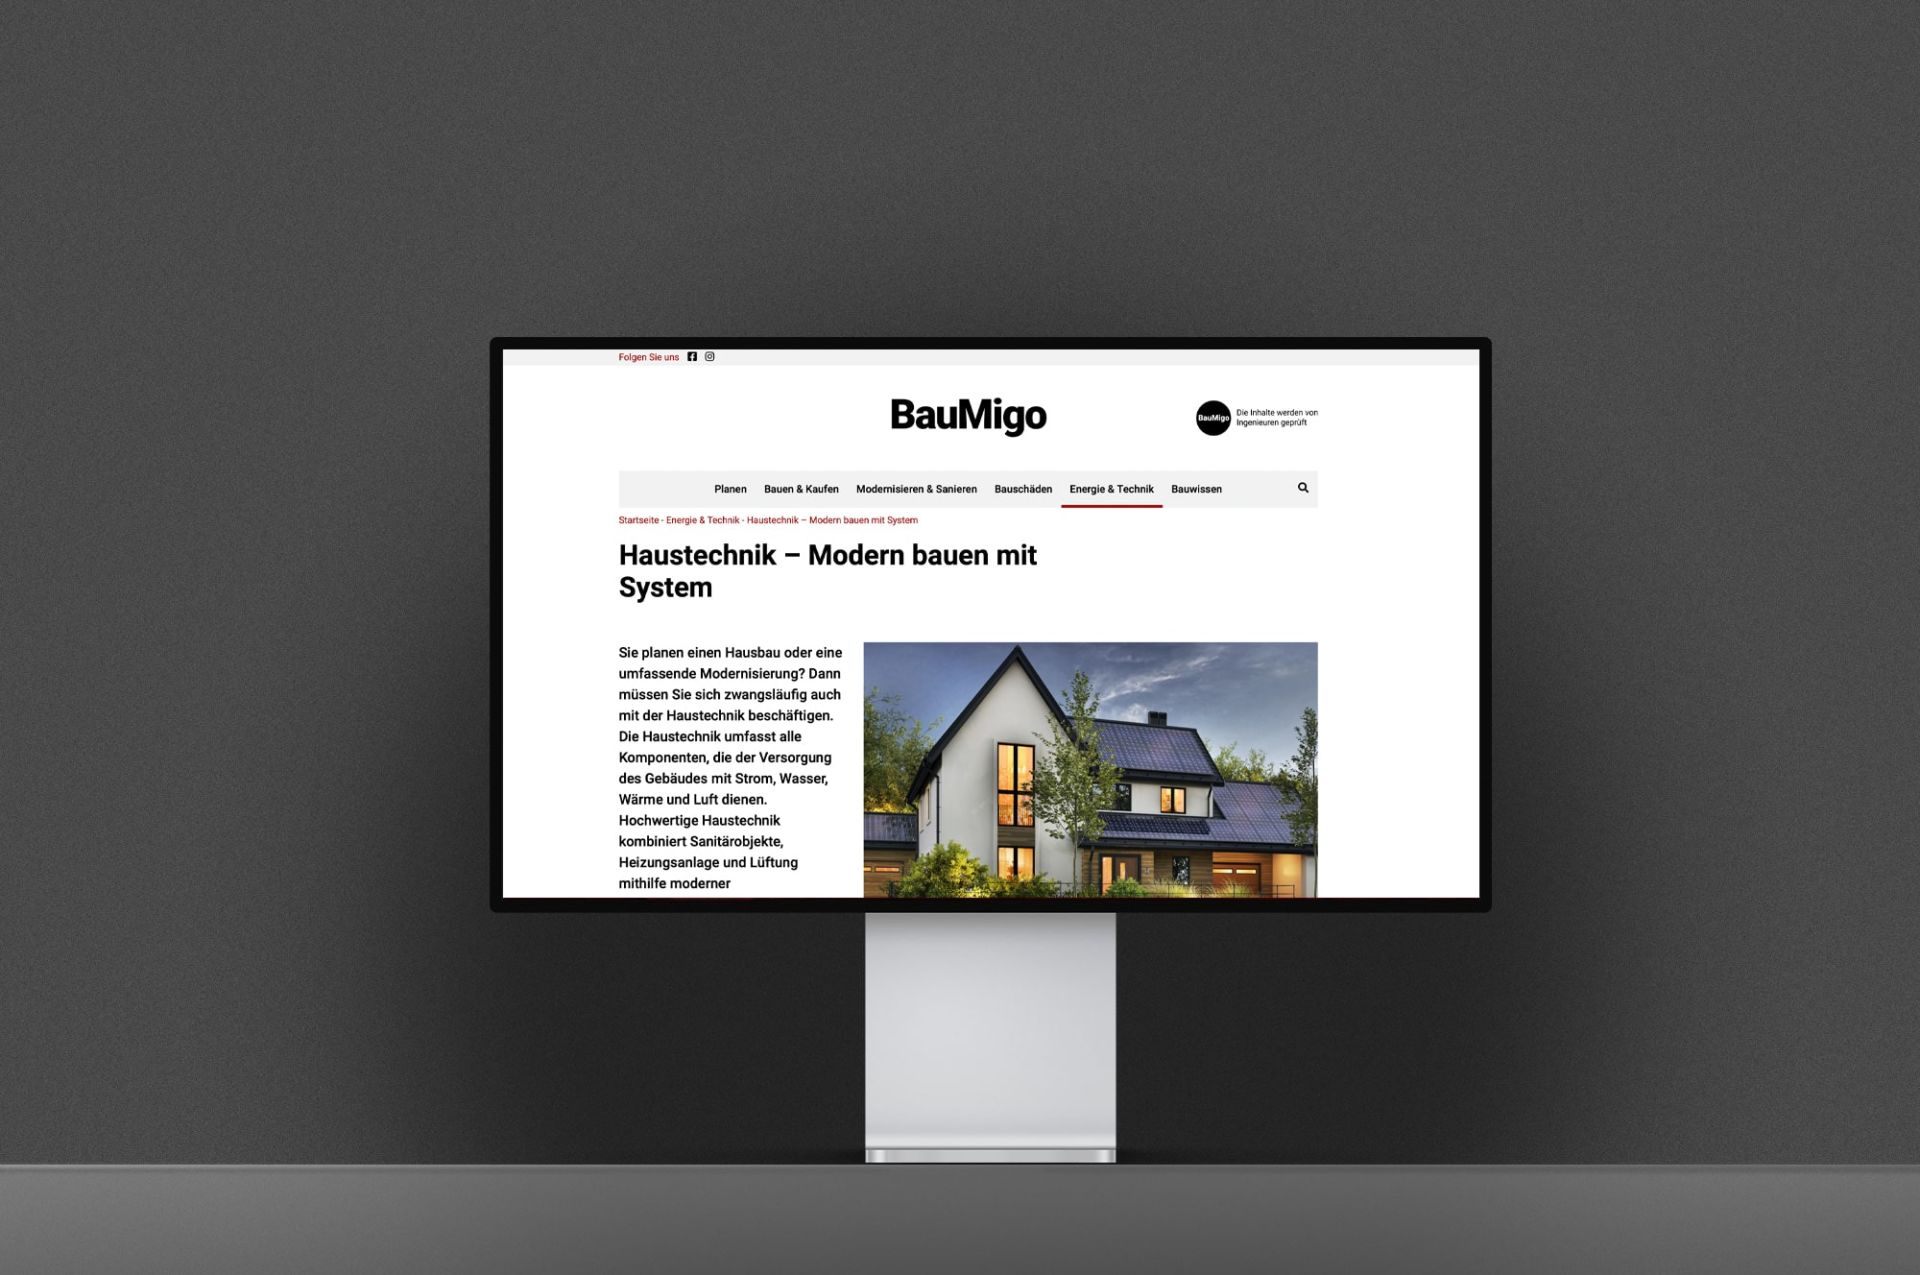 BauMigo_Monitor-Pro-Display-XDR-Mockup_001